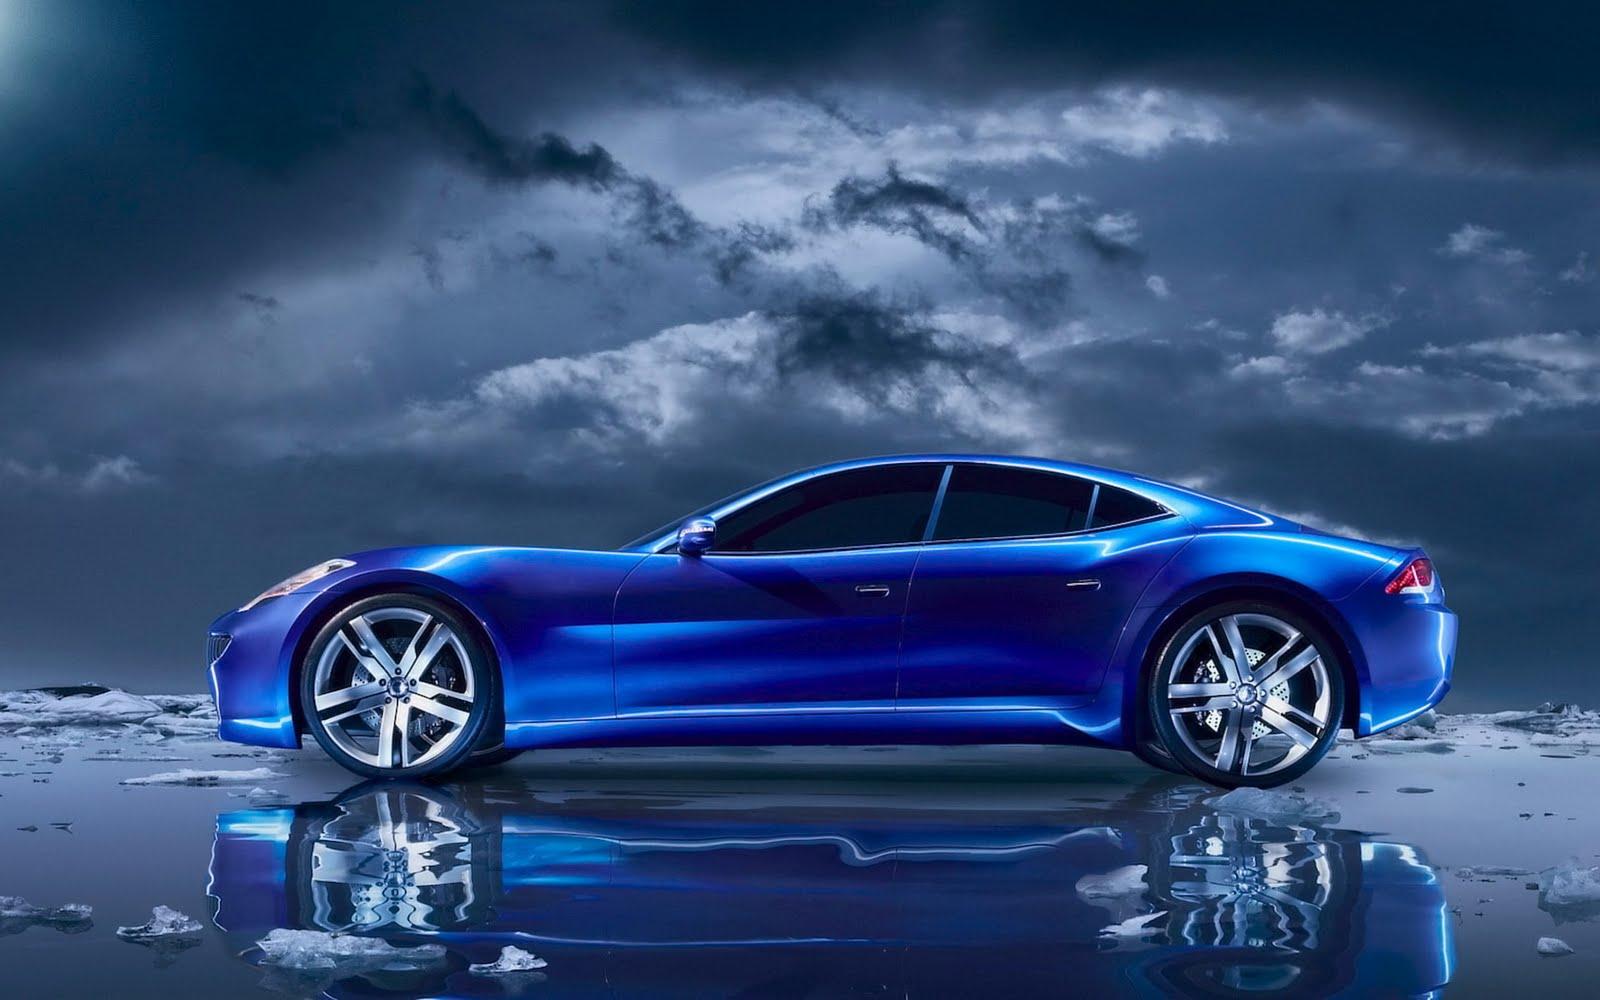 http://3.bp.blogspot.com/_aIrU_NInAww/S96epdo9eRI/AAAAAAAAAI8/7b-EwxXRkx8/s1600/laba.ws_New_Cars_HD_%200029.jpg